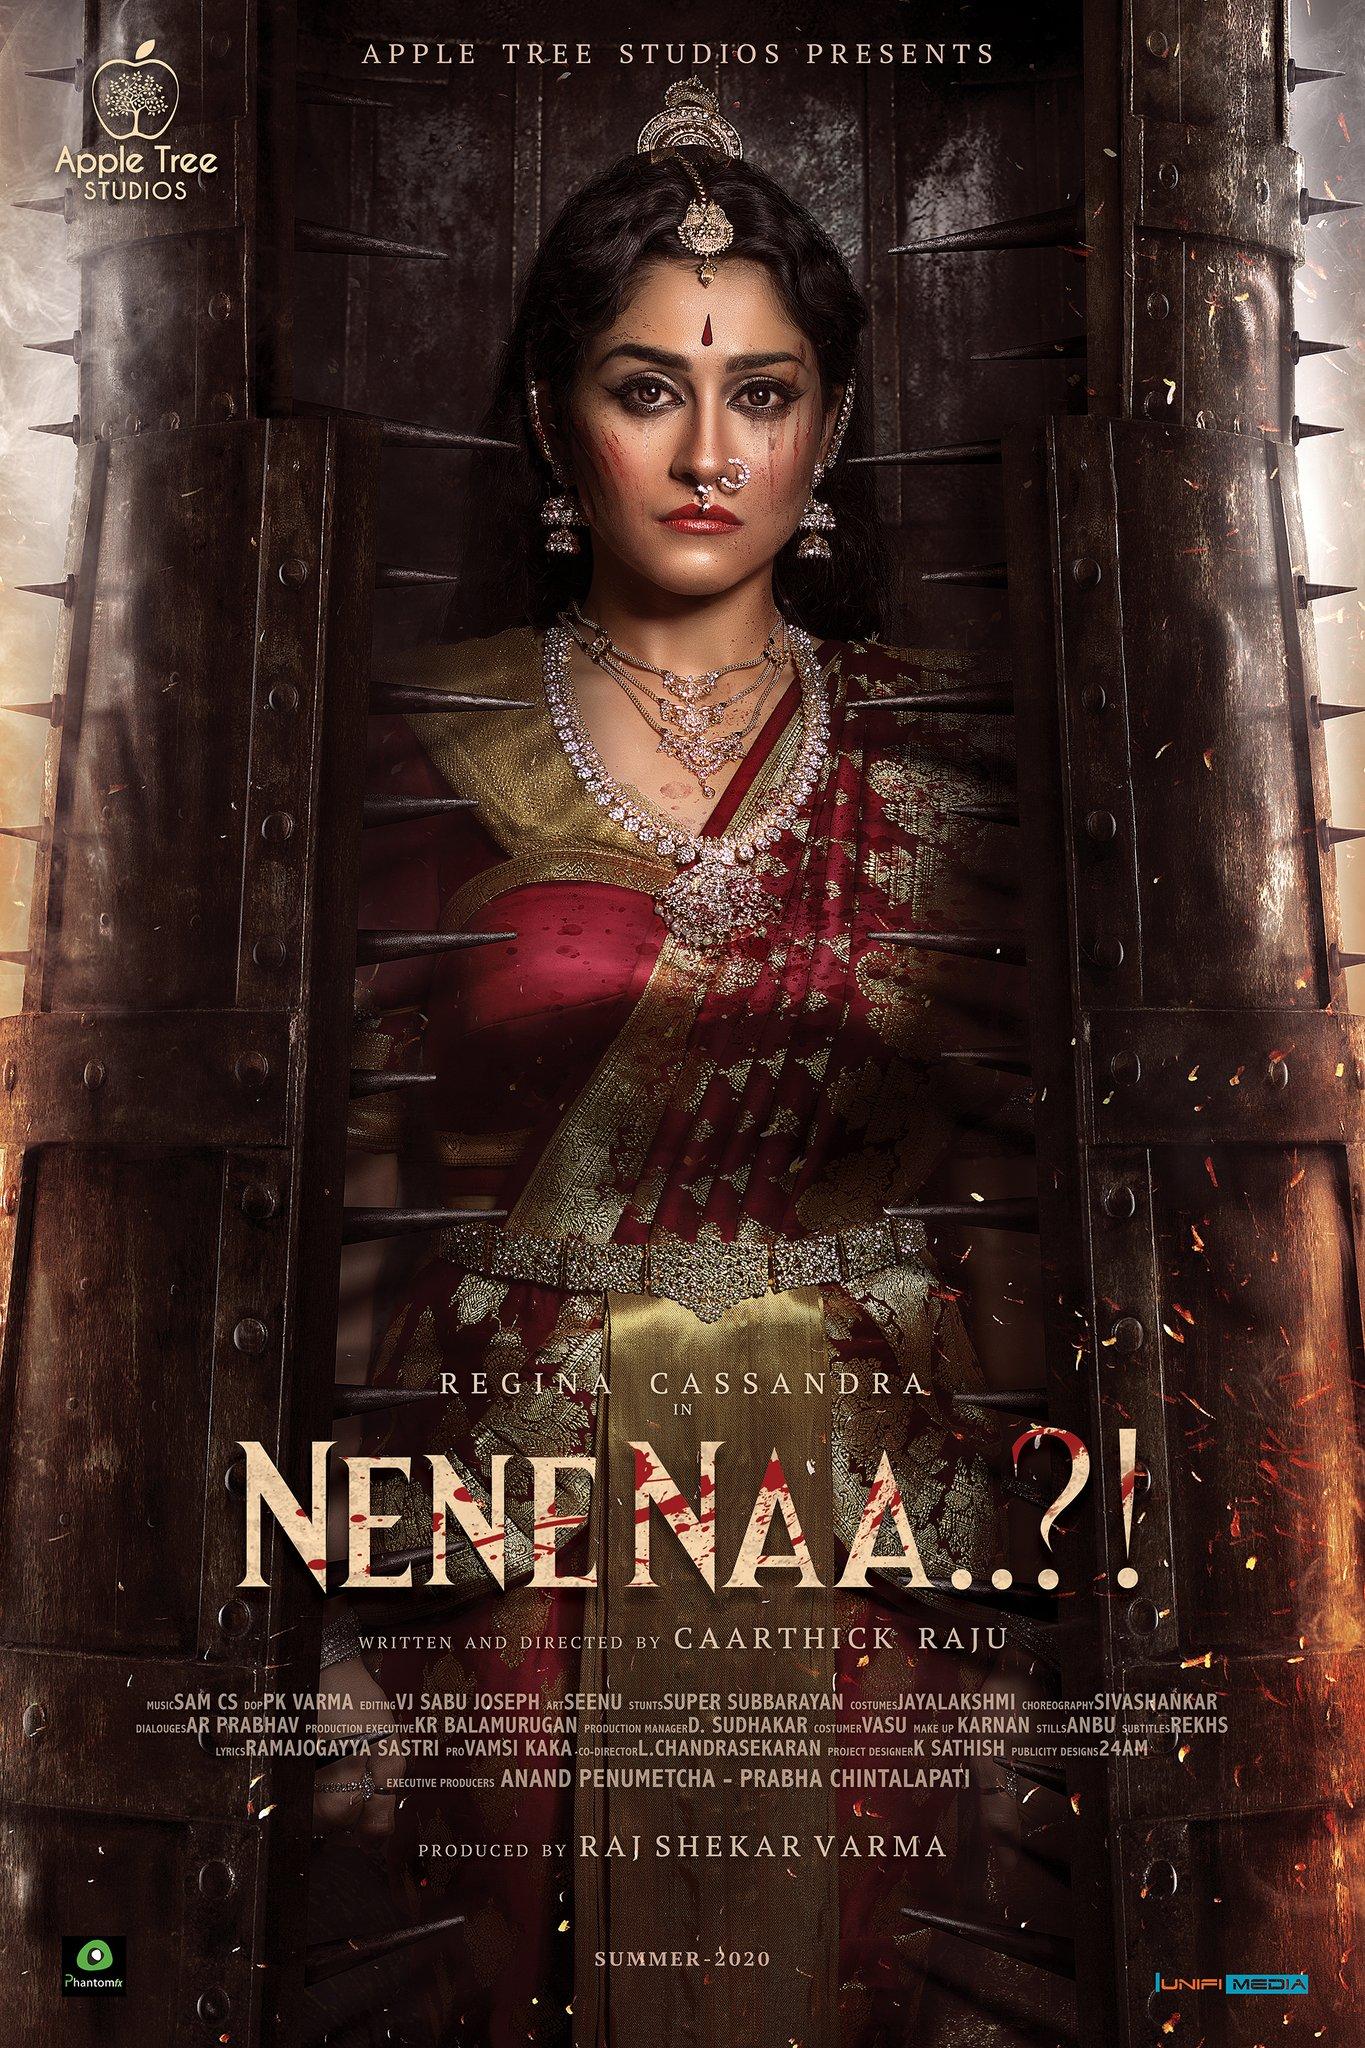 Actress Regina Cassandra Nene Naa Movie First Look Poster HD